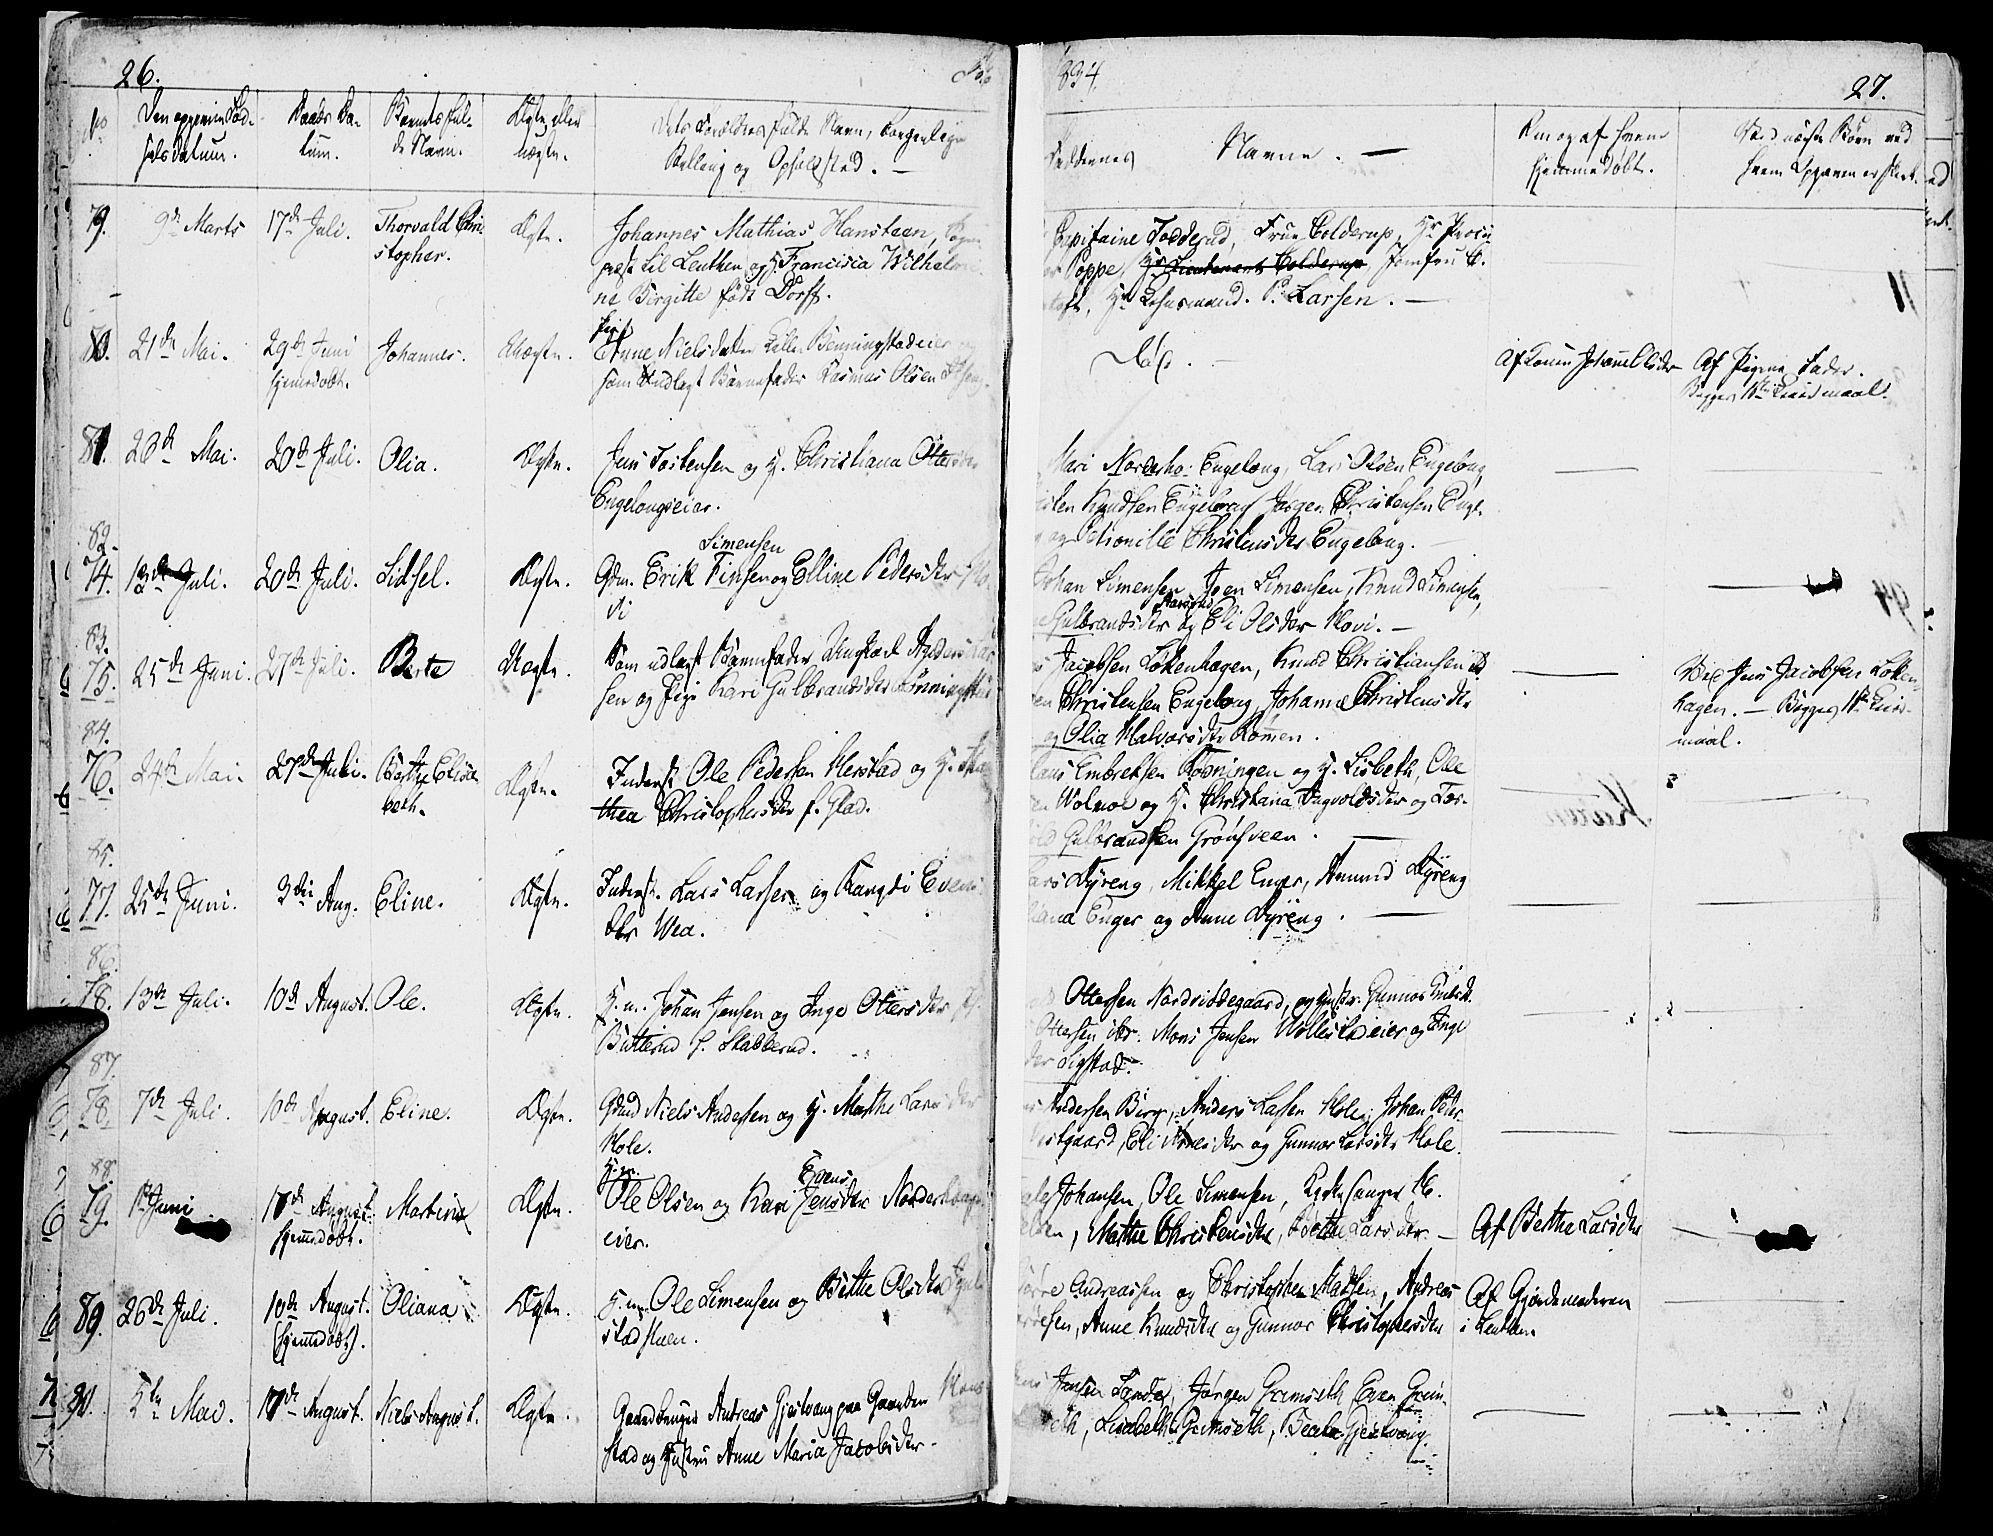 SAH, Løten prestekontor, K/Ka/L0006: Ministerialbok nr. 6, 1832-1849, s. 26-27